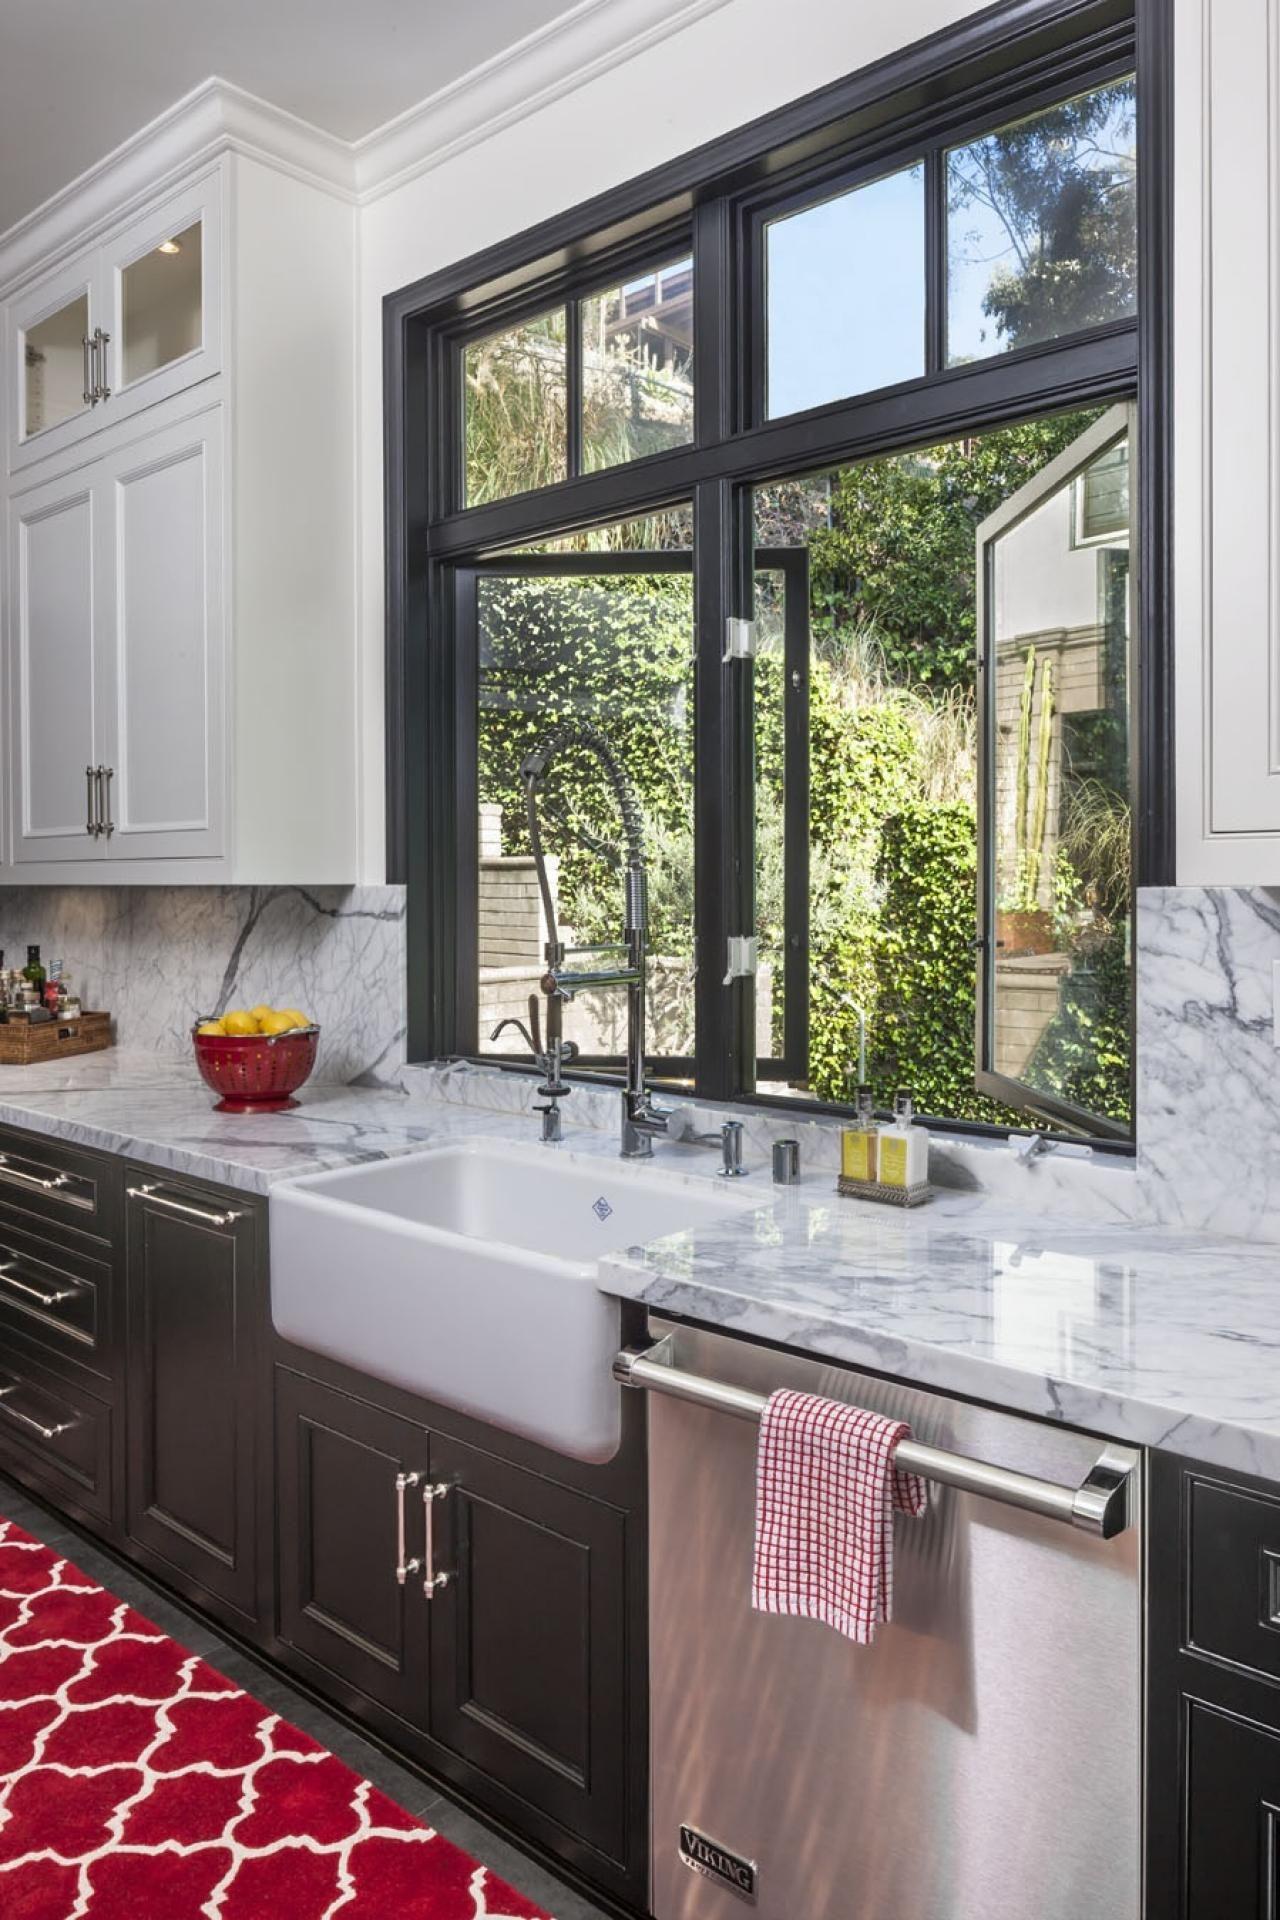 Low window behind kitchen sink  a white farmhouse sink sits below a darkframed window that opens